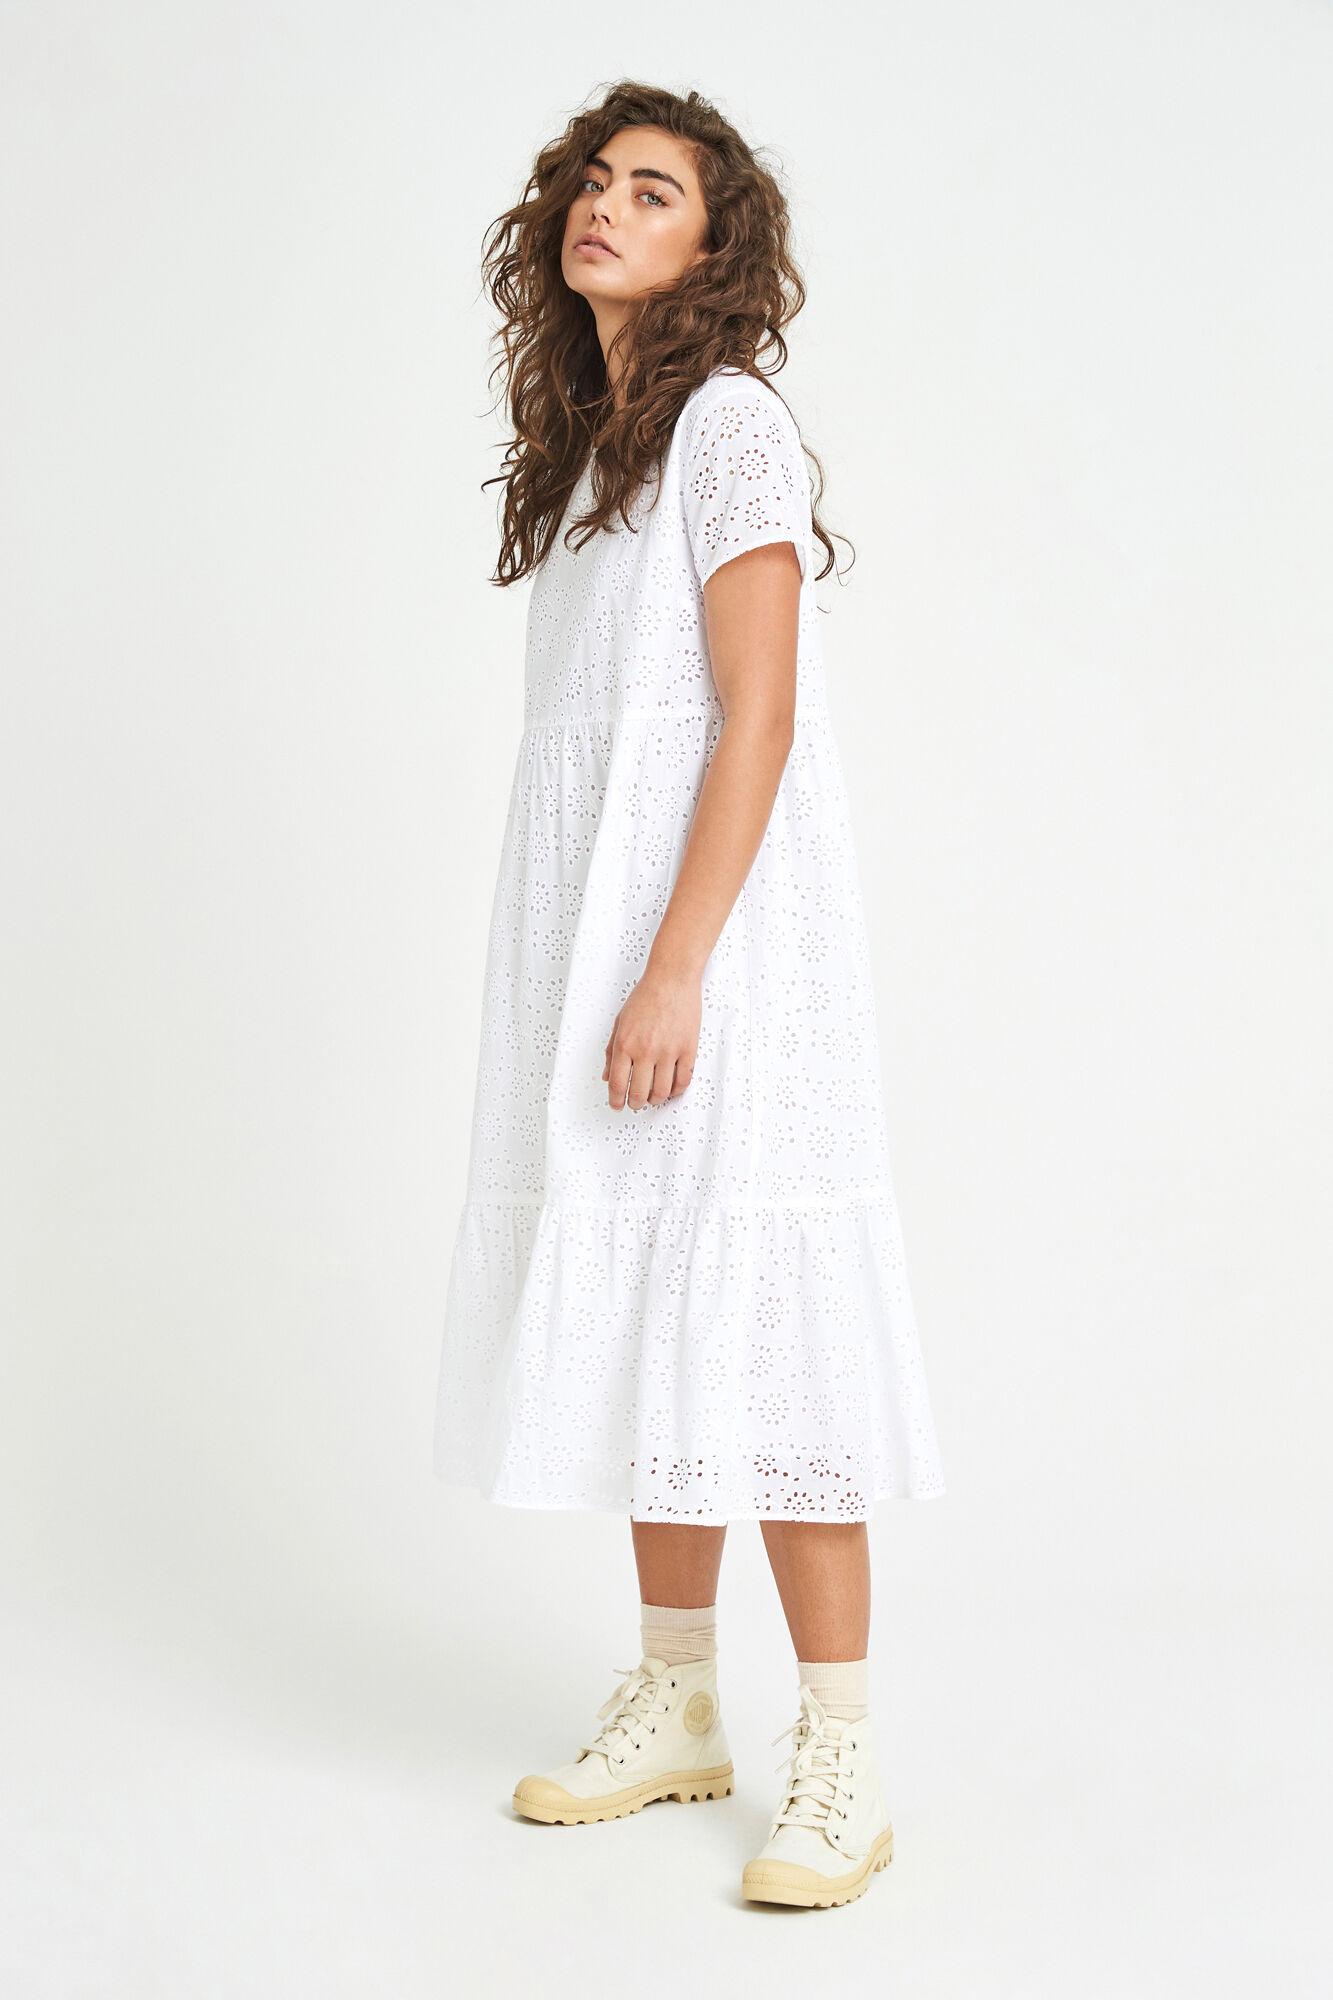 ENTRACY SS DRESS 6732